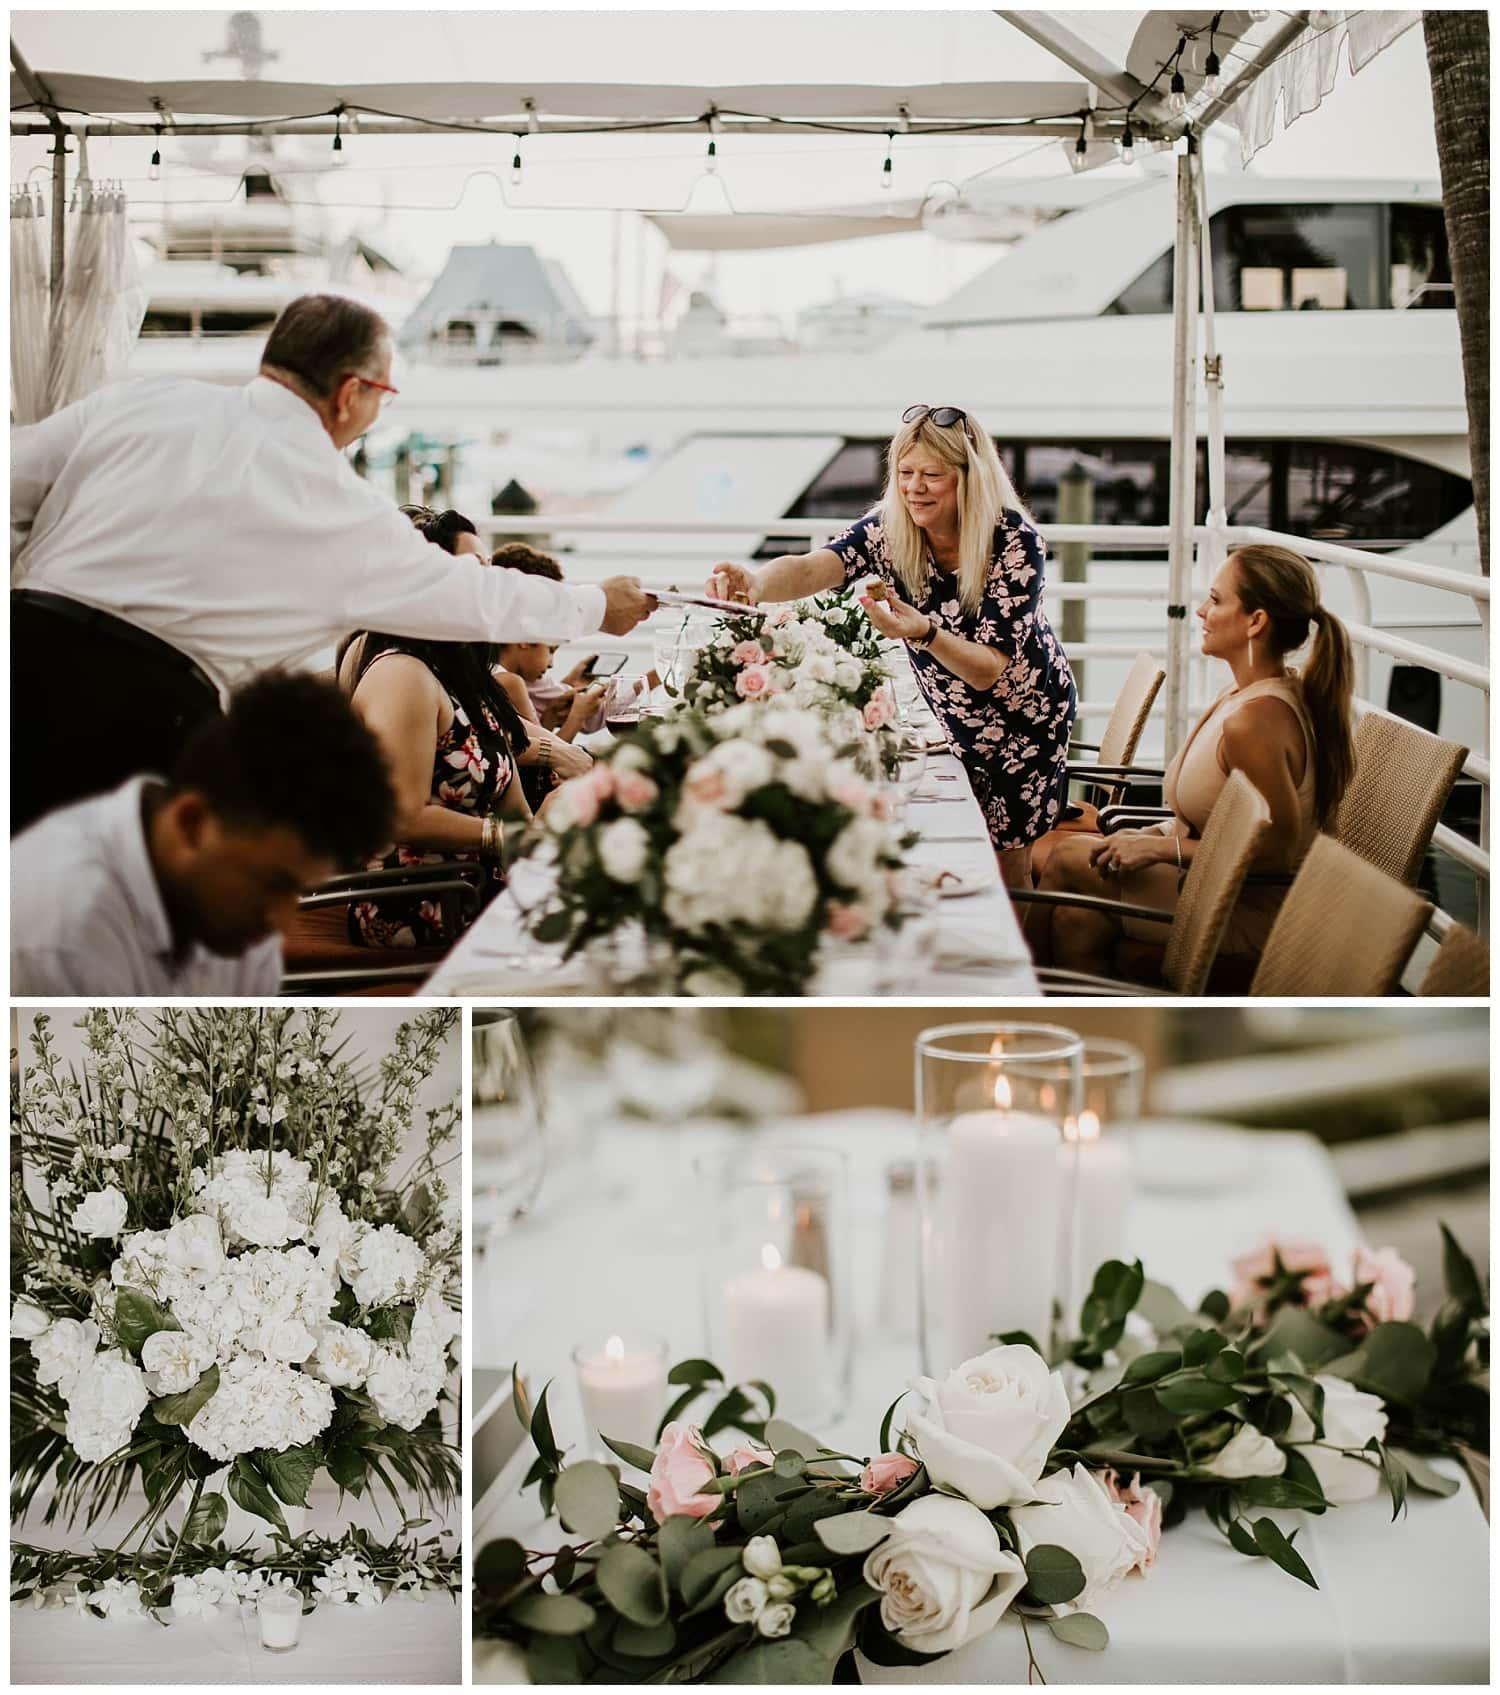 grille-66-marina-wedding-fort-lauderdale_0049.jpg